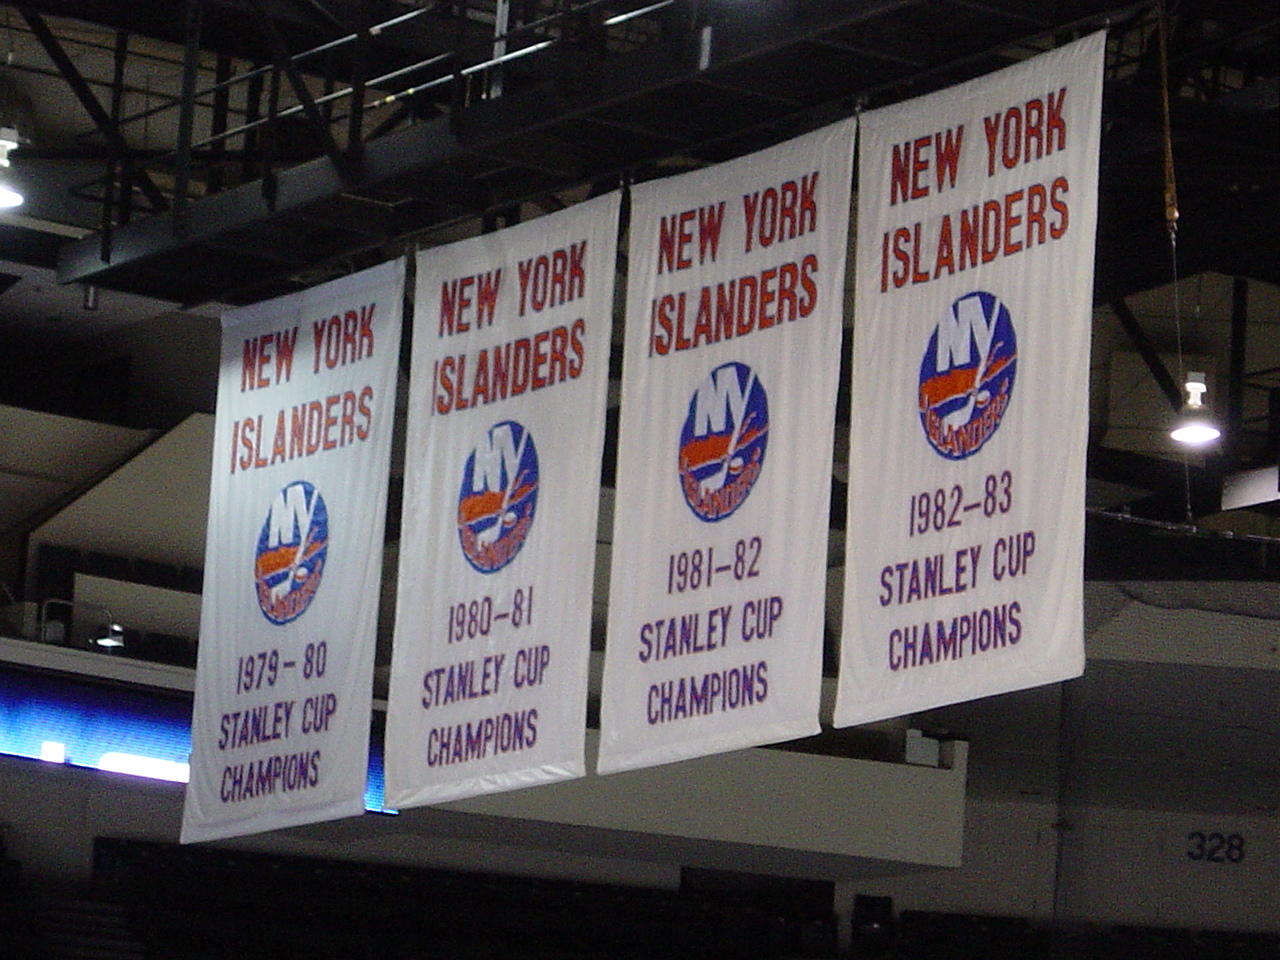 May-24: The Islanders' Dynasty Begins and the Oilers' Last Hurrah